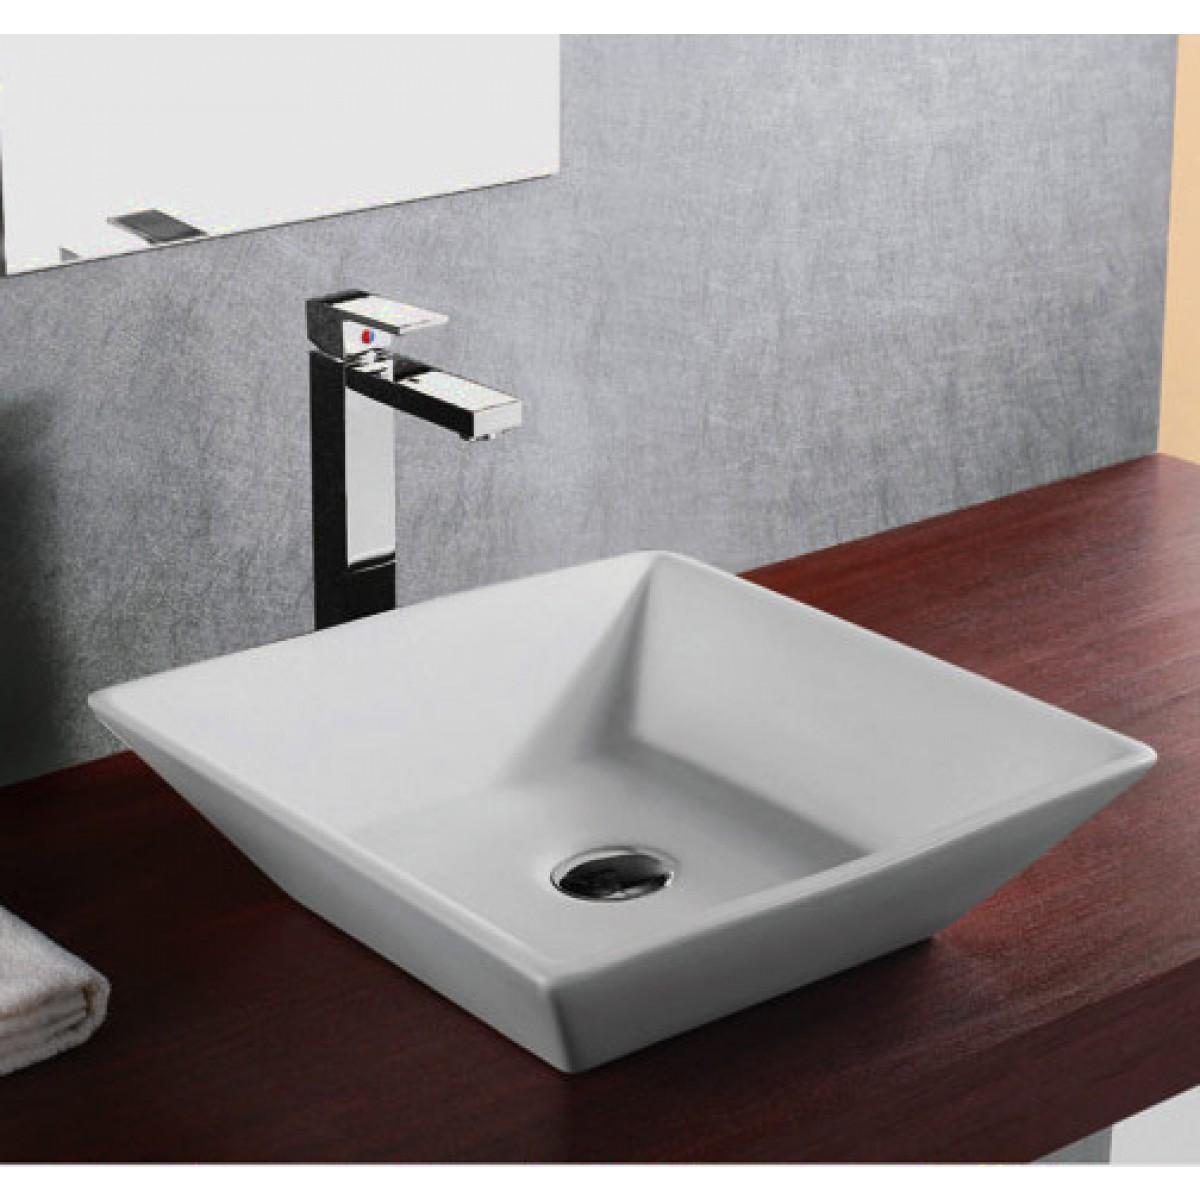 european design slope wall porcelain ceramic countertop bathroom vessel sink 16 x 16 x 4 1 2 inch